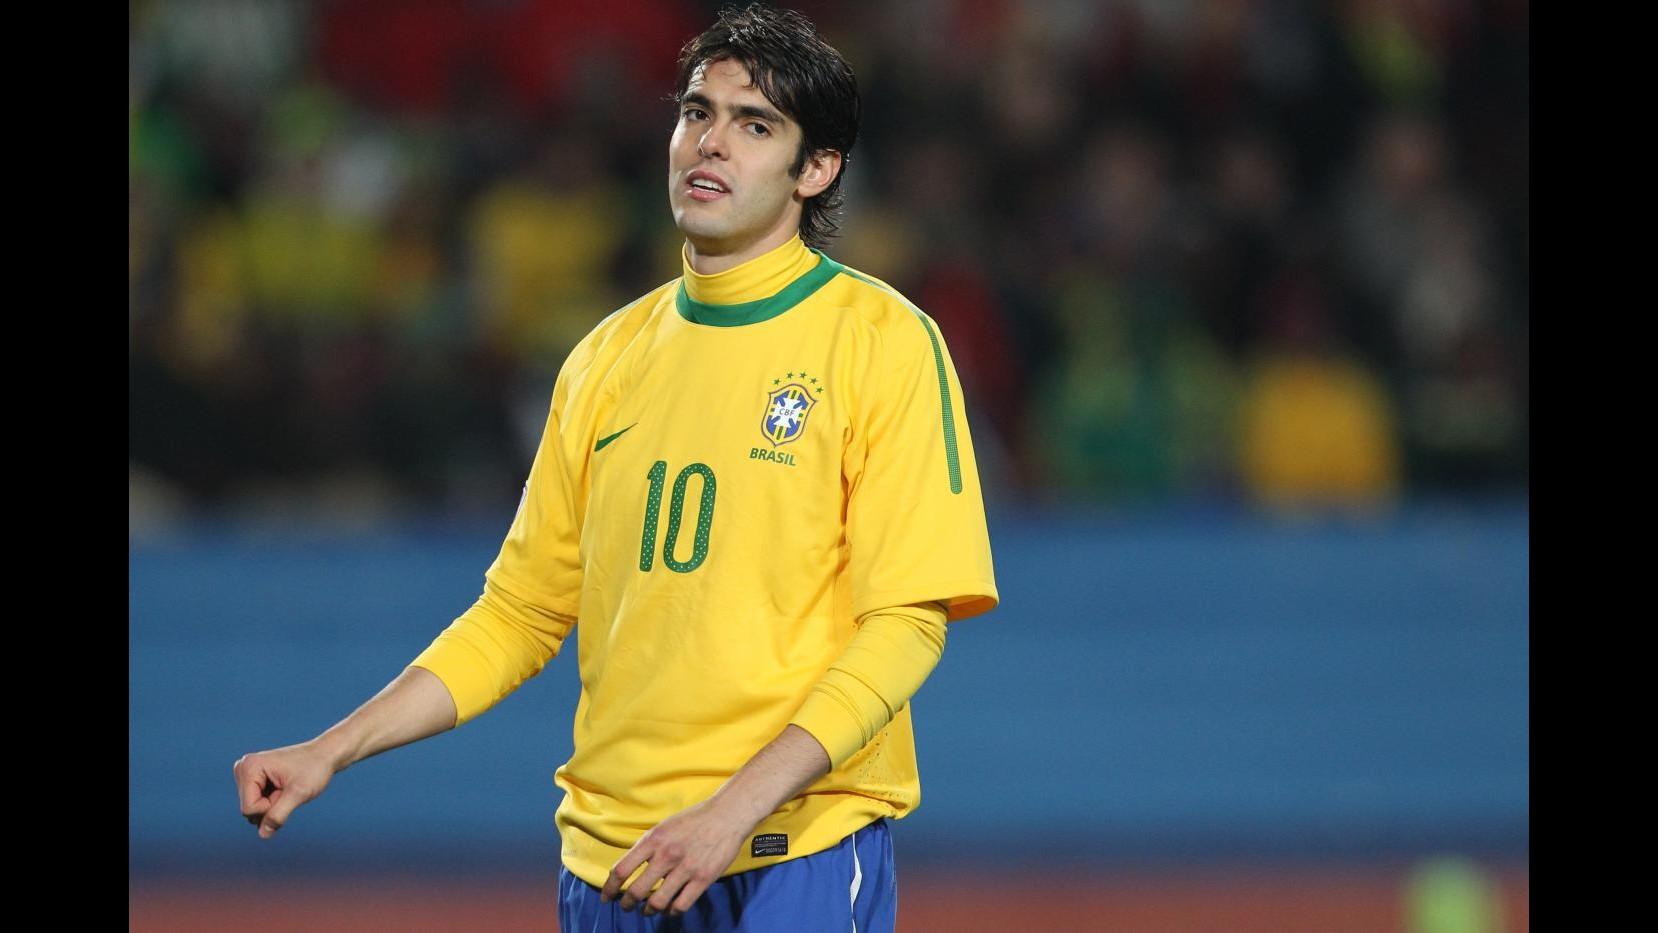 Brasile: Kaka torna in Nazionale, Castan unico 'italiano'